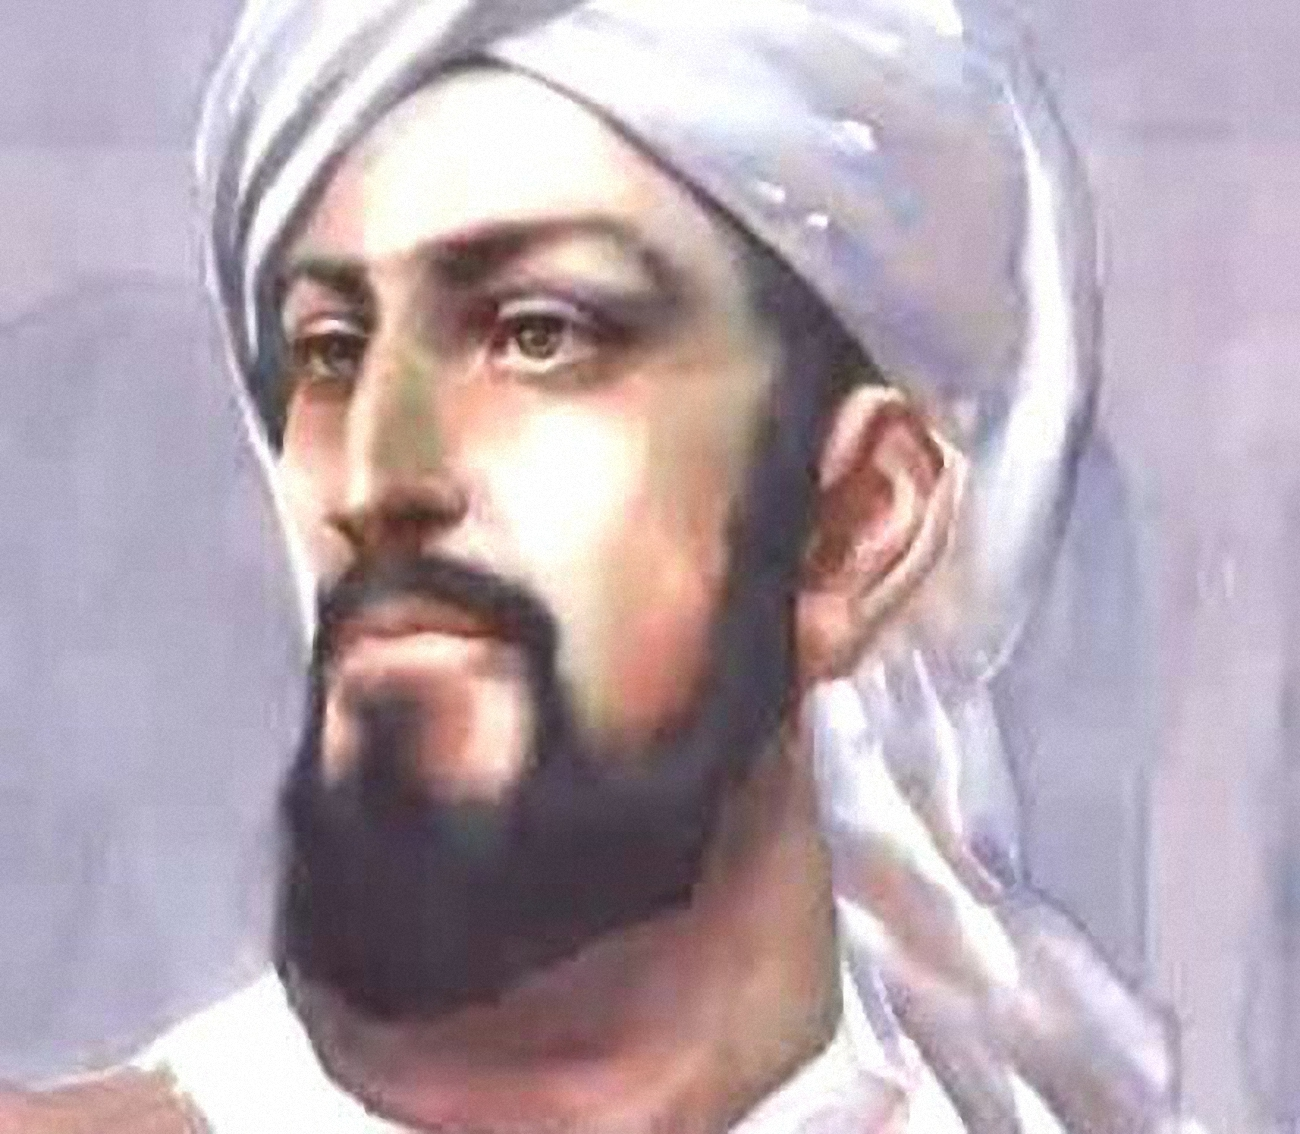 Nhà phát minh Ismail al-Jazari. Ảnh: History.